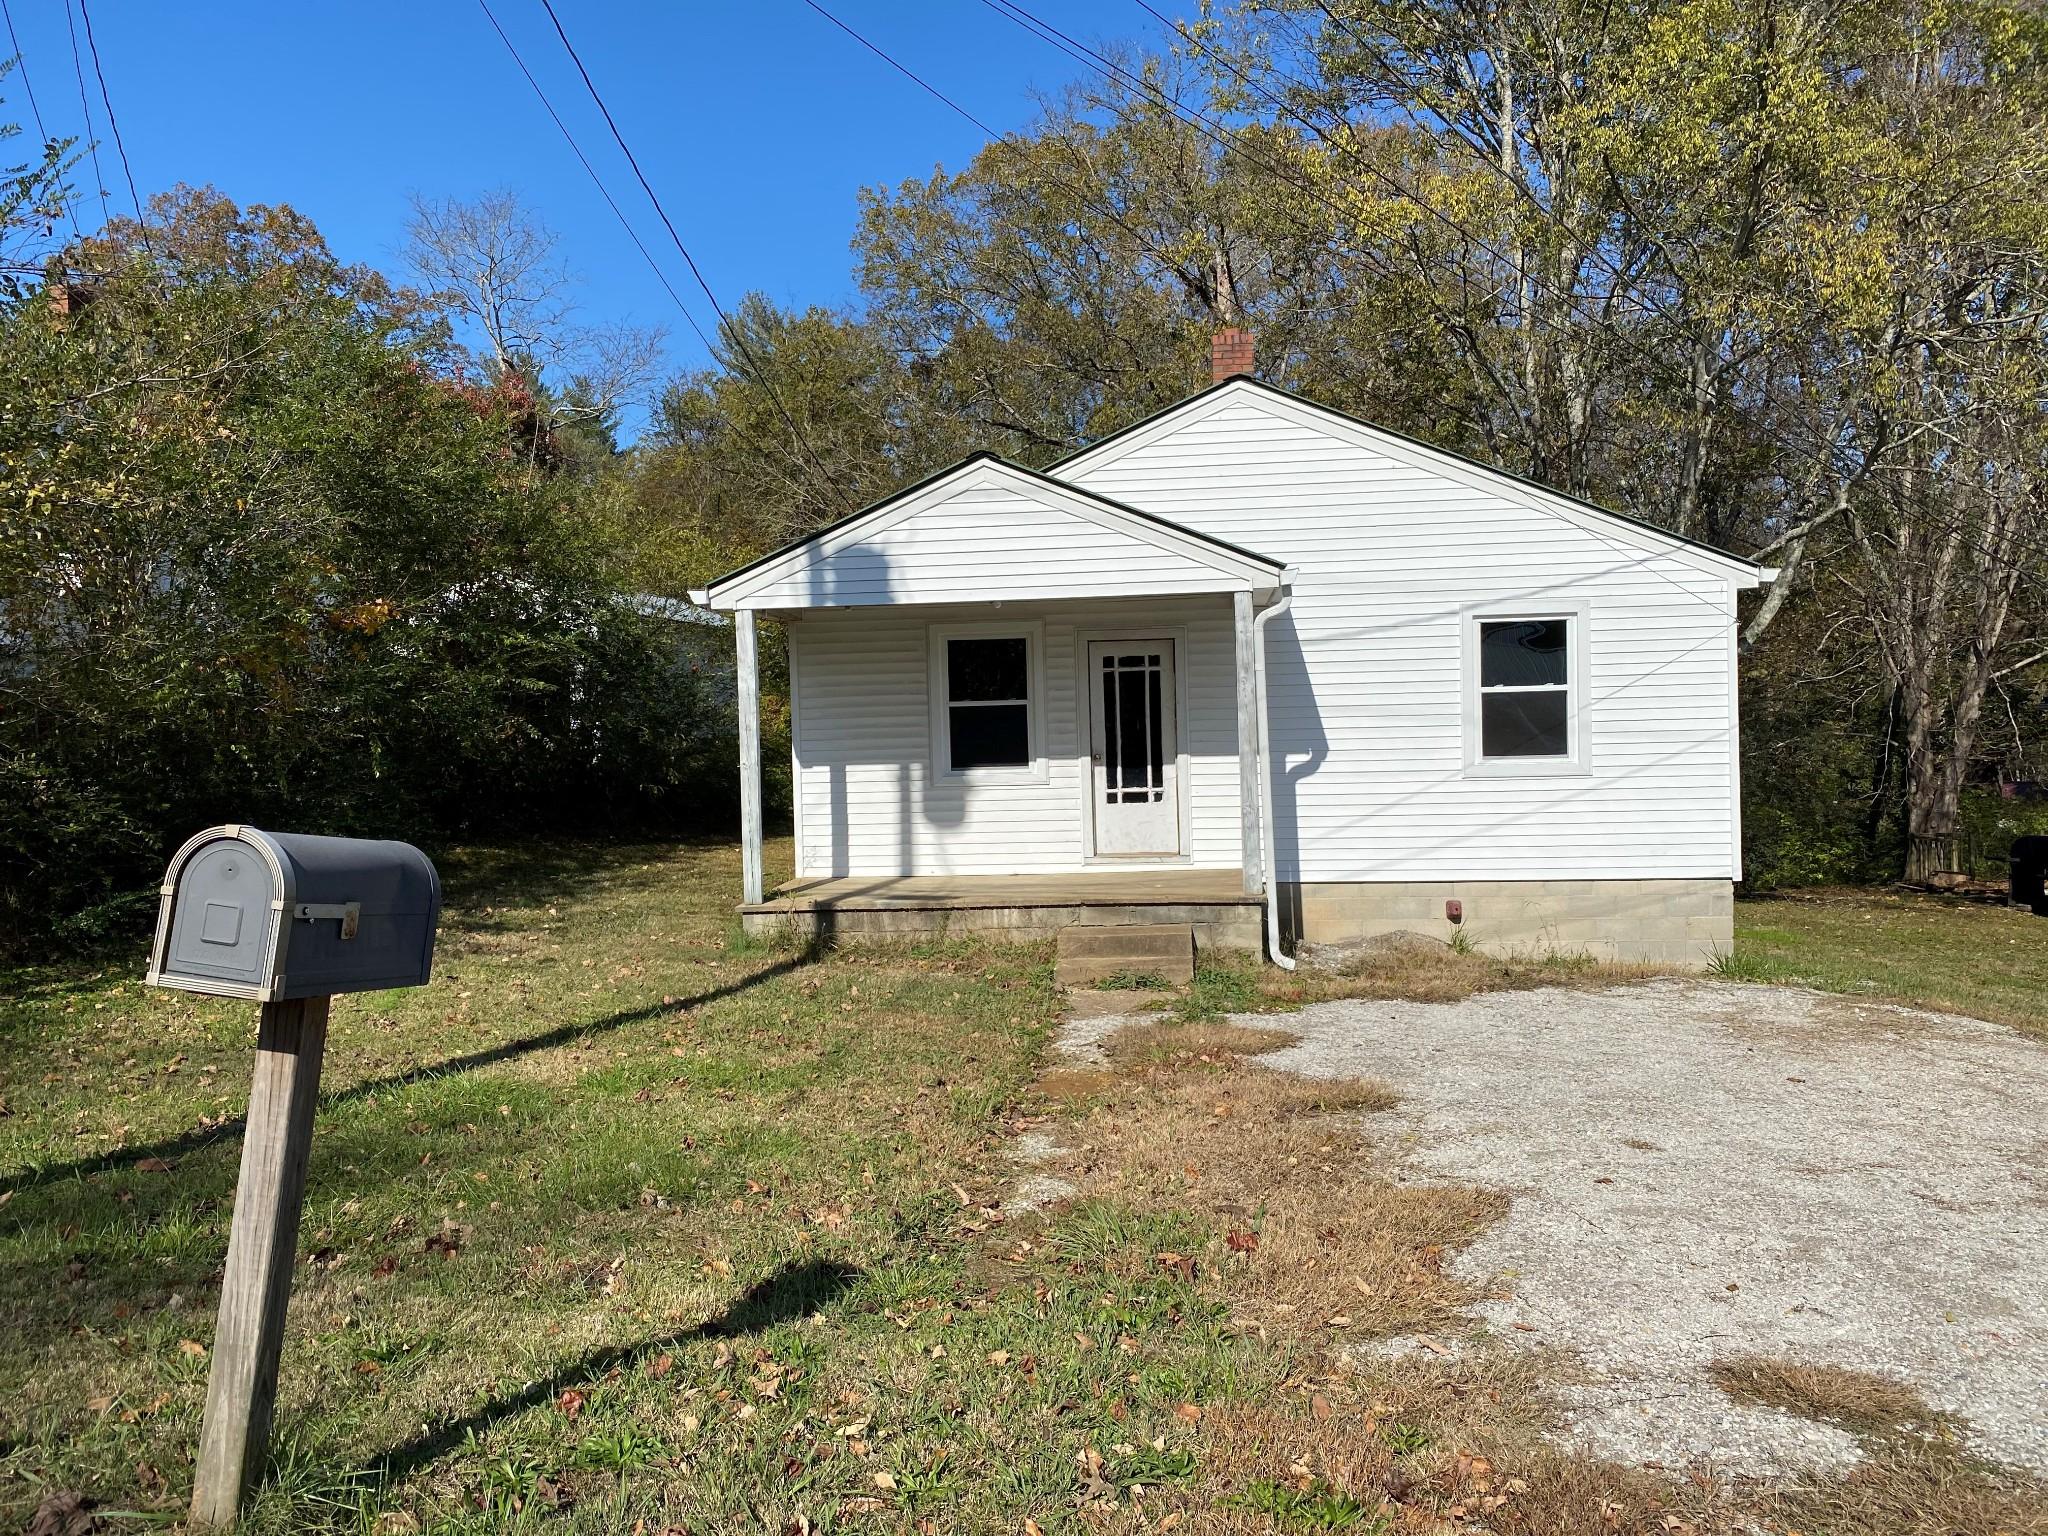 109 Riverside Dr, Centerville, TN 37033 - Centerville, TN real estate listing